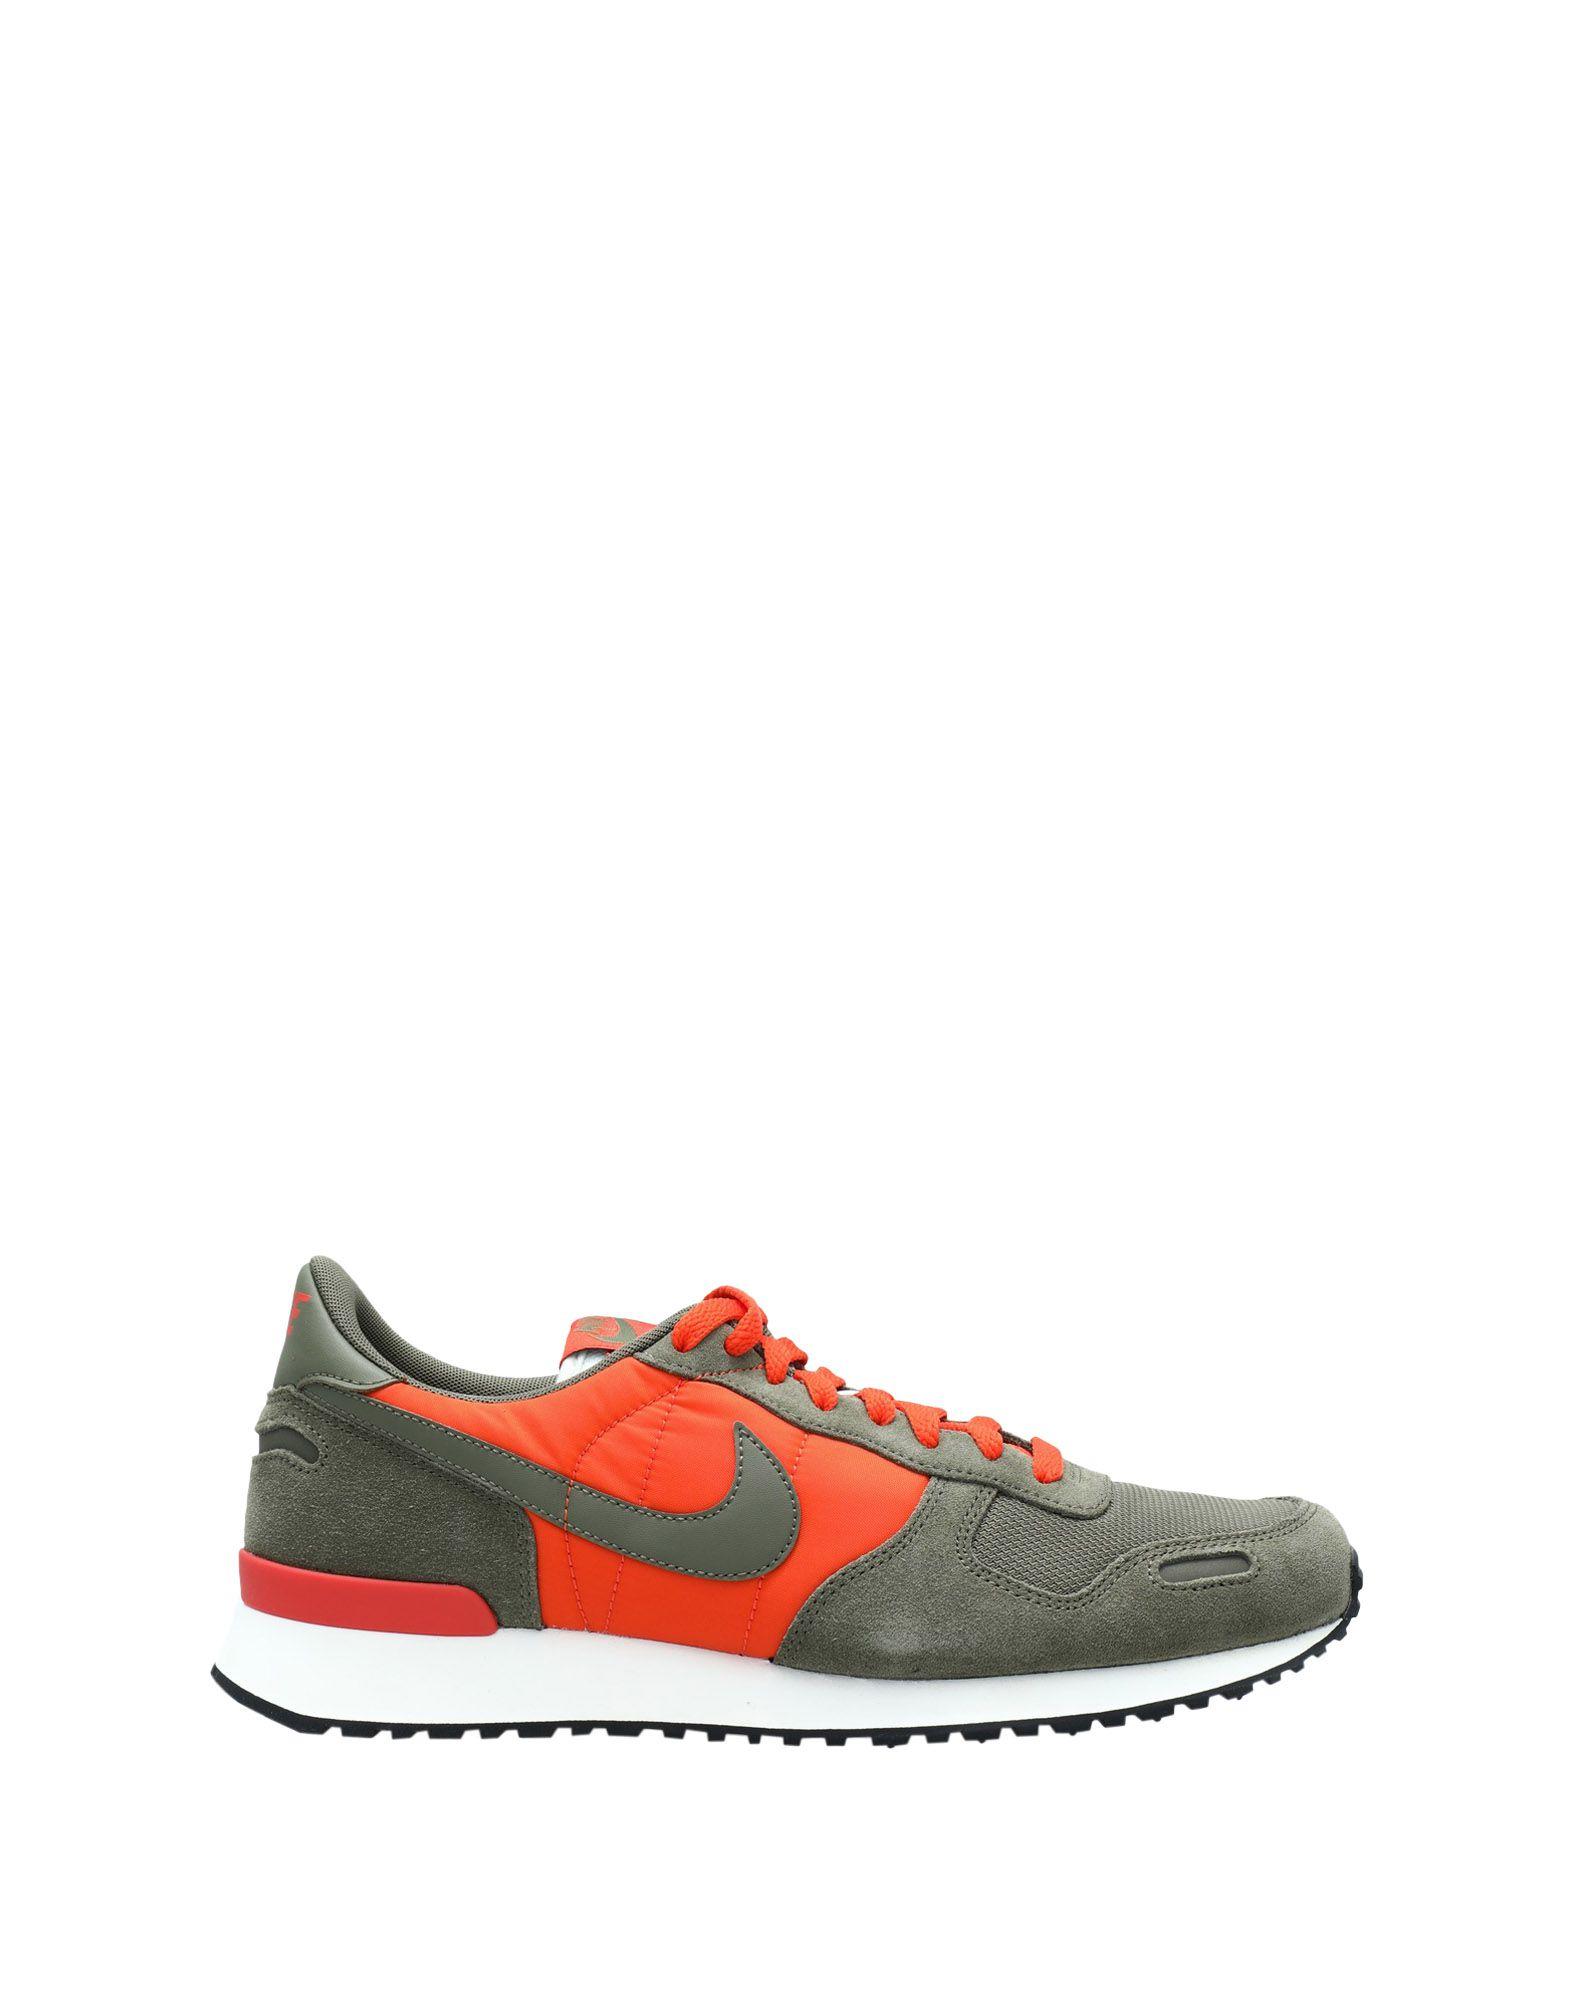 Nike   Air Vortex - Uomo - 11539699HH